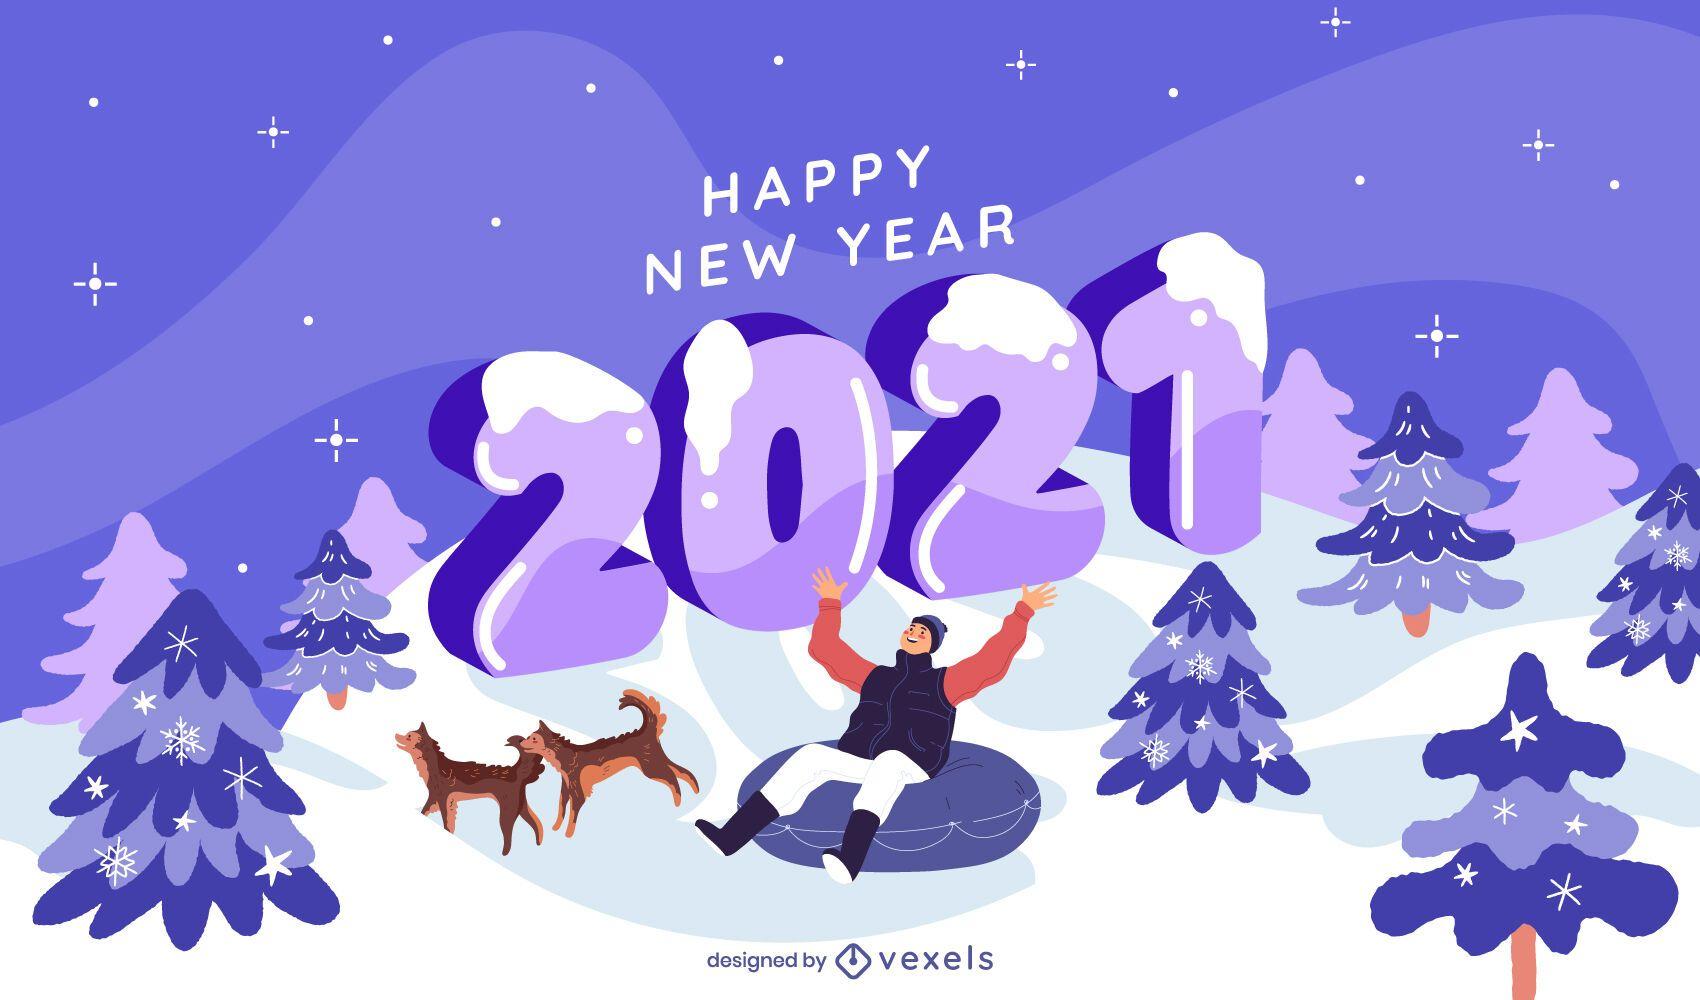 New year 2021 winter illustration design